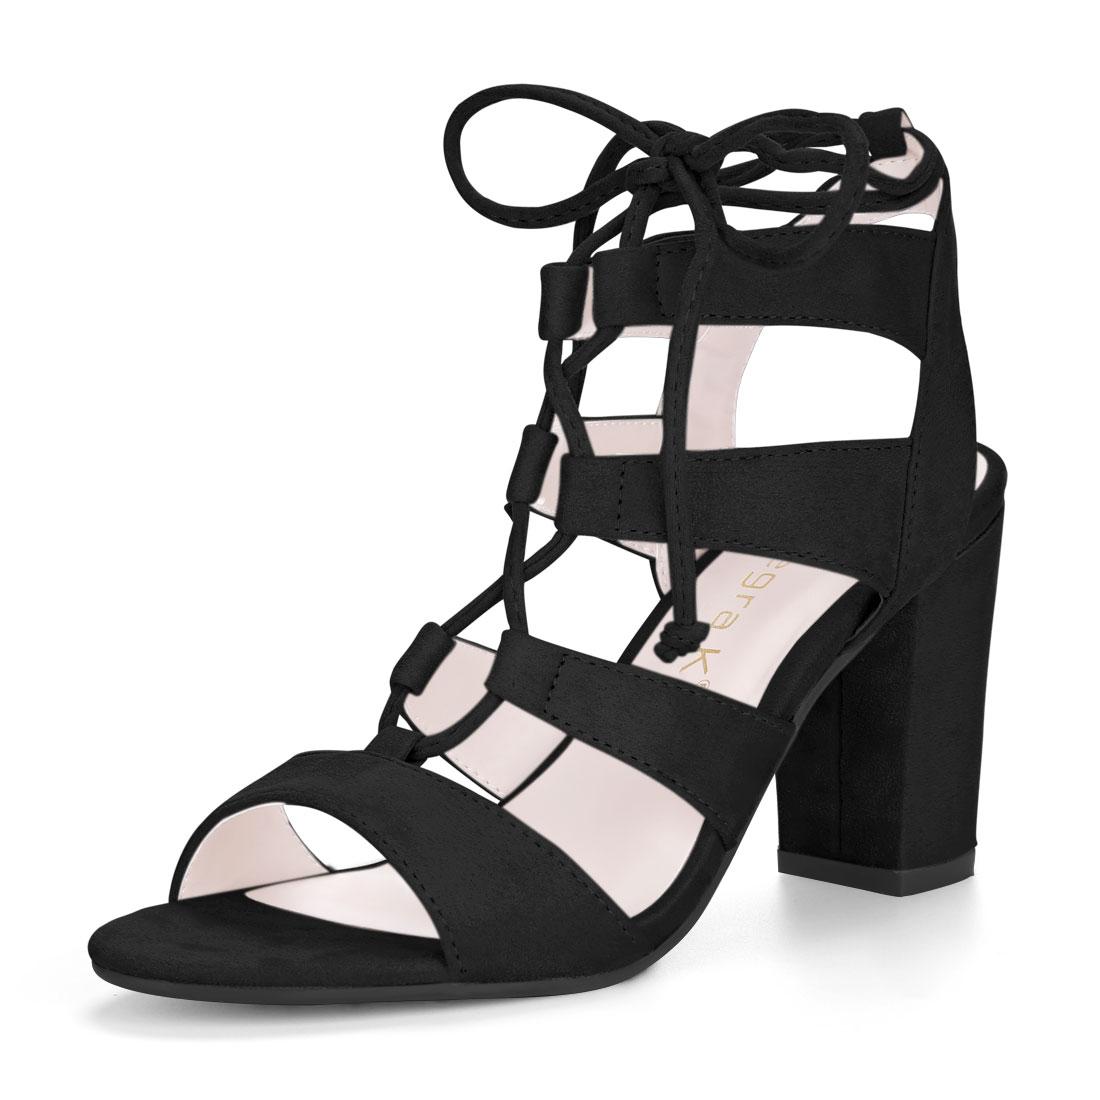 Allegra K Women's Tie Up Strappy Gladiator Block Heel Sandals Black US 9